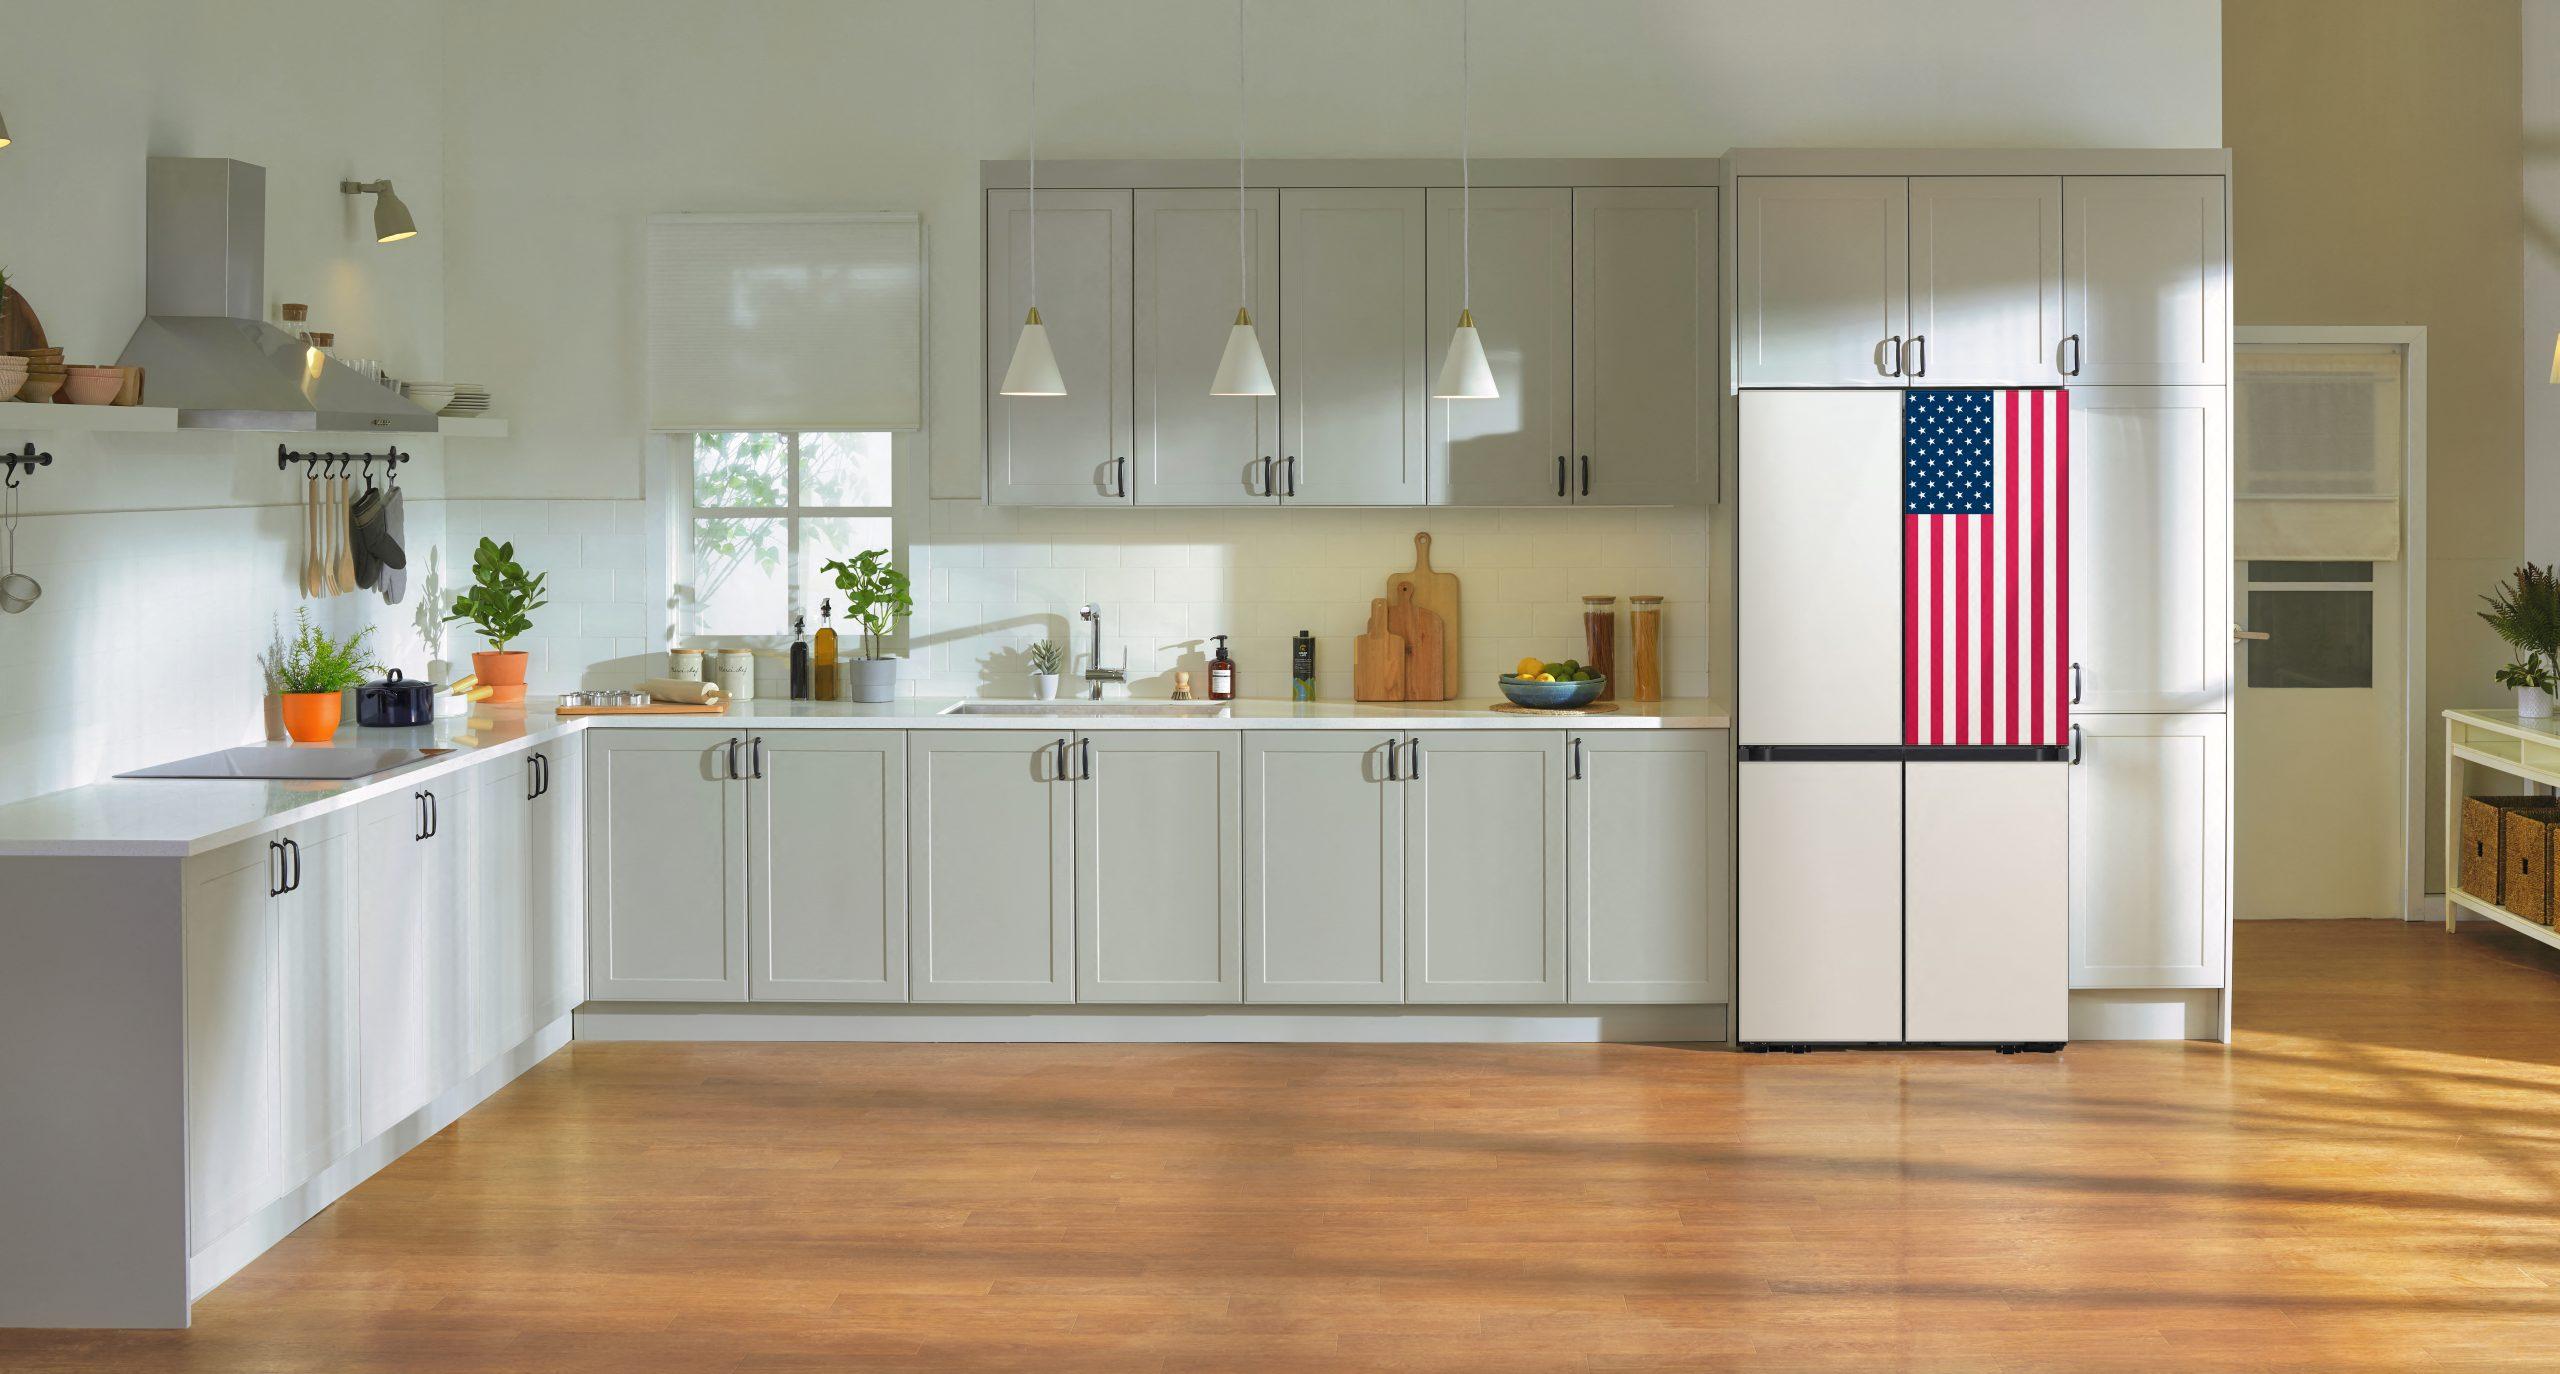 Bespoke 4-Door Flex™ refrigerator with stars and stripes design